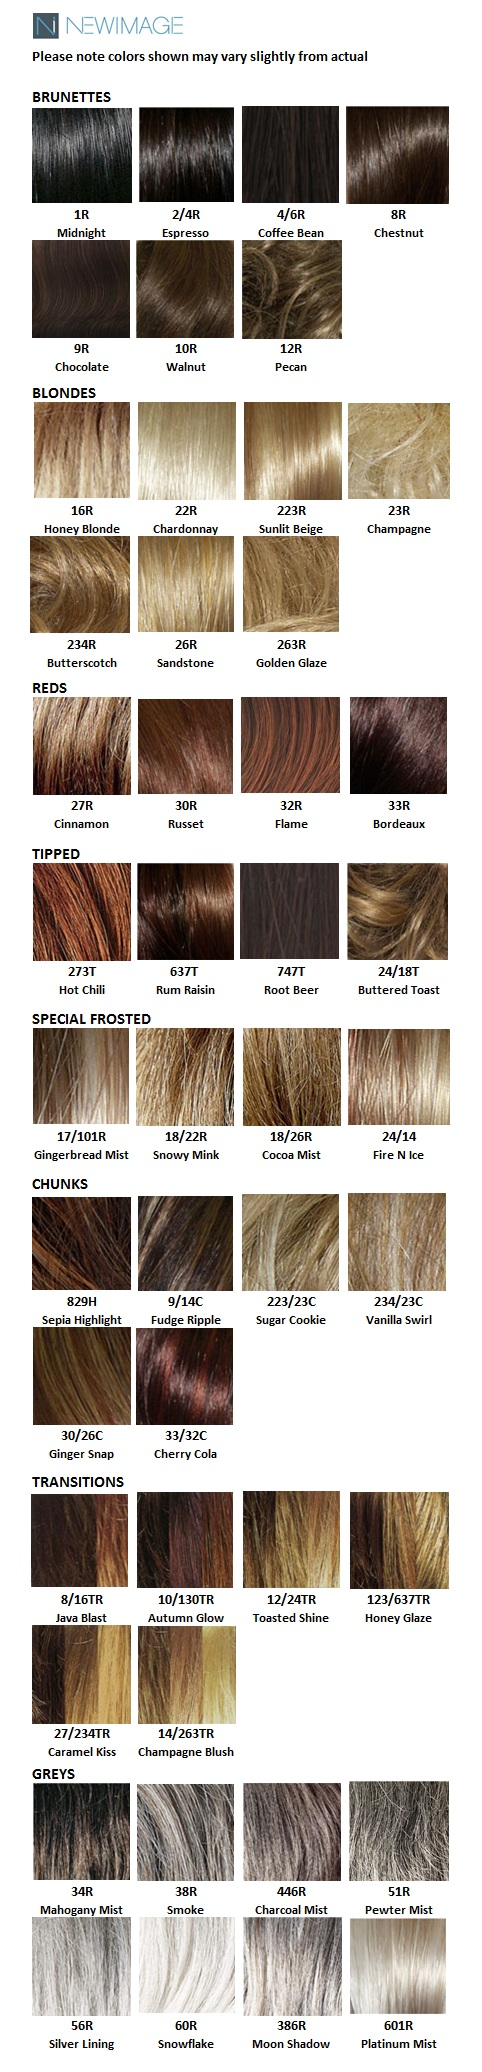 New Image Colour Chart